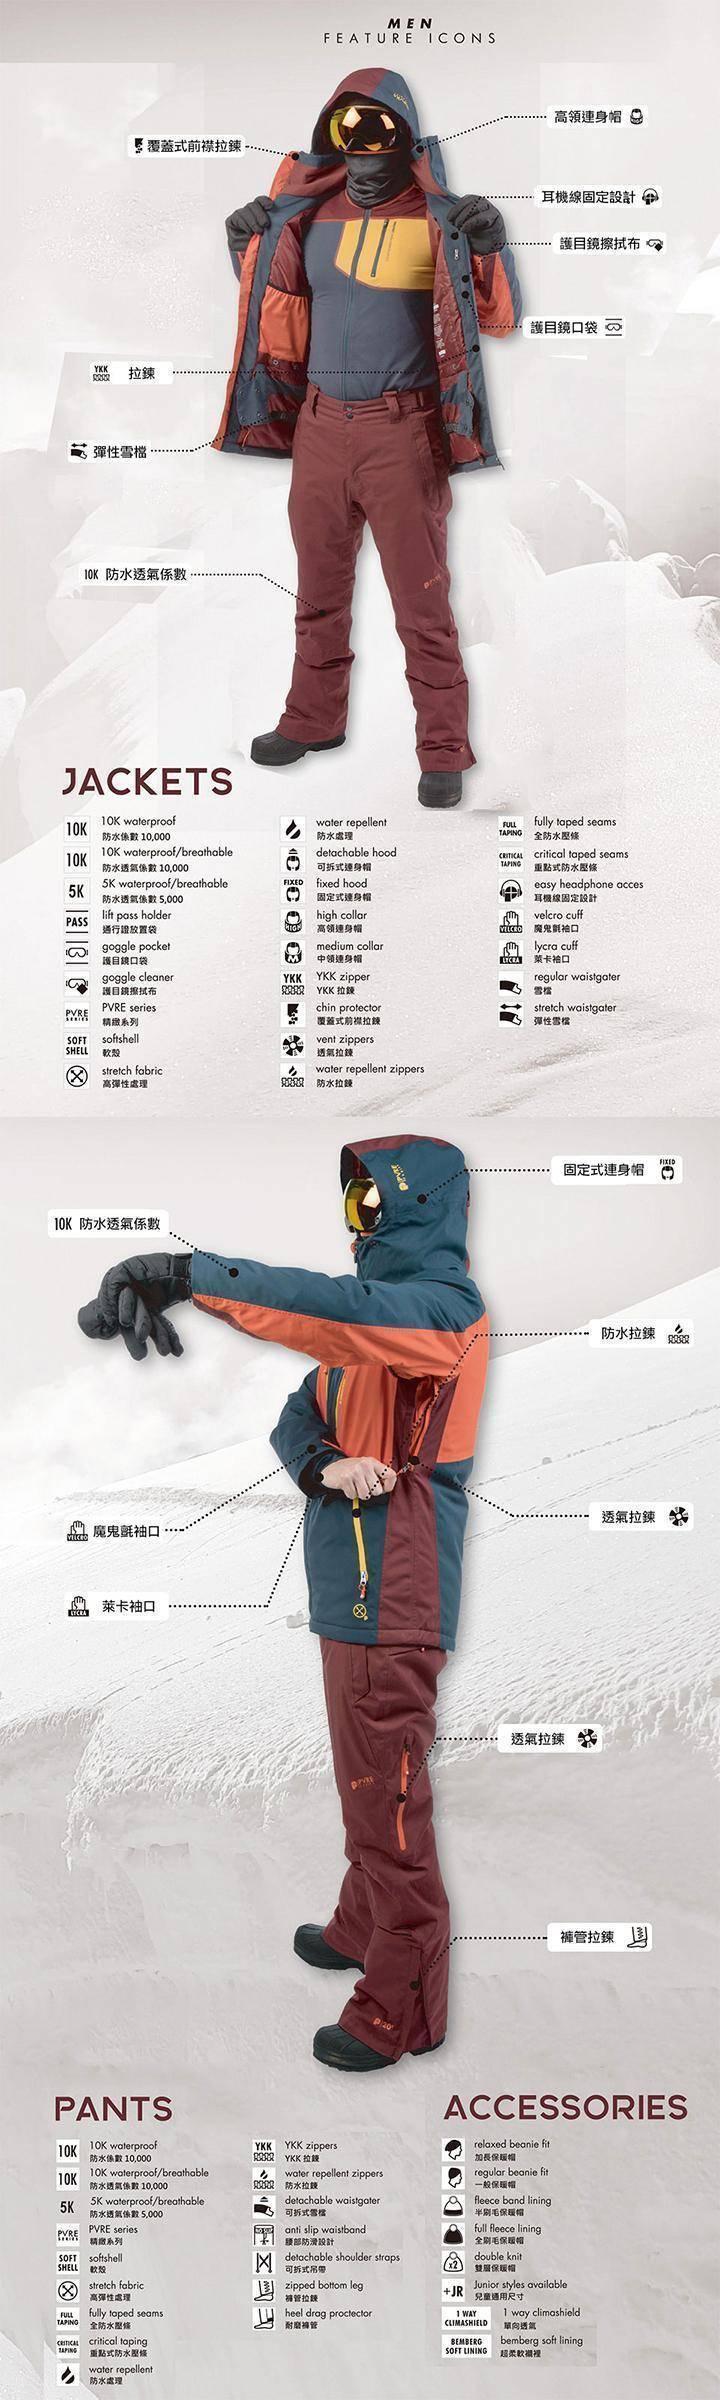 PROTEST 男 雪褲 (亞馬遜綠) MANLEY SNOWPANTS